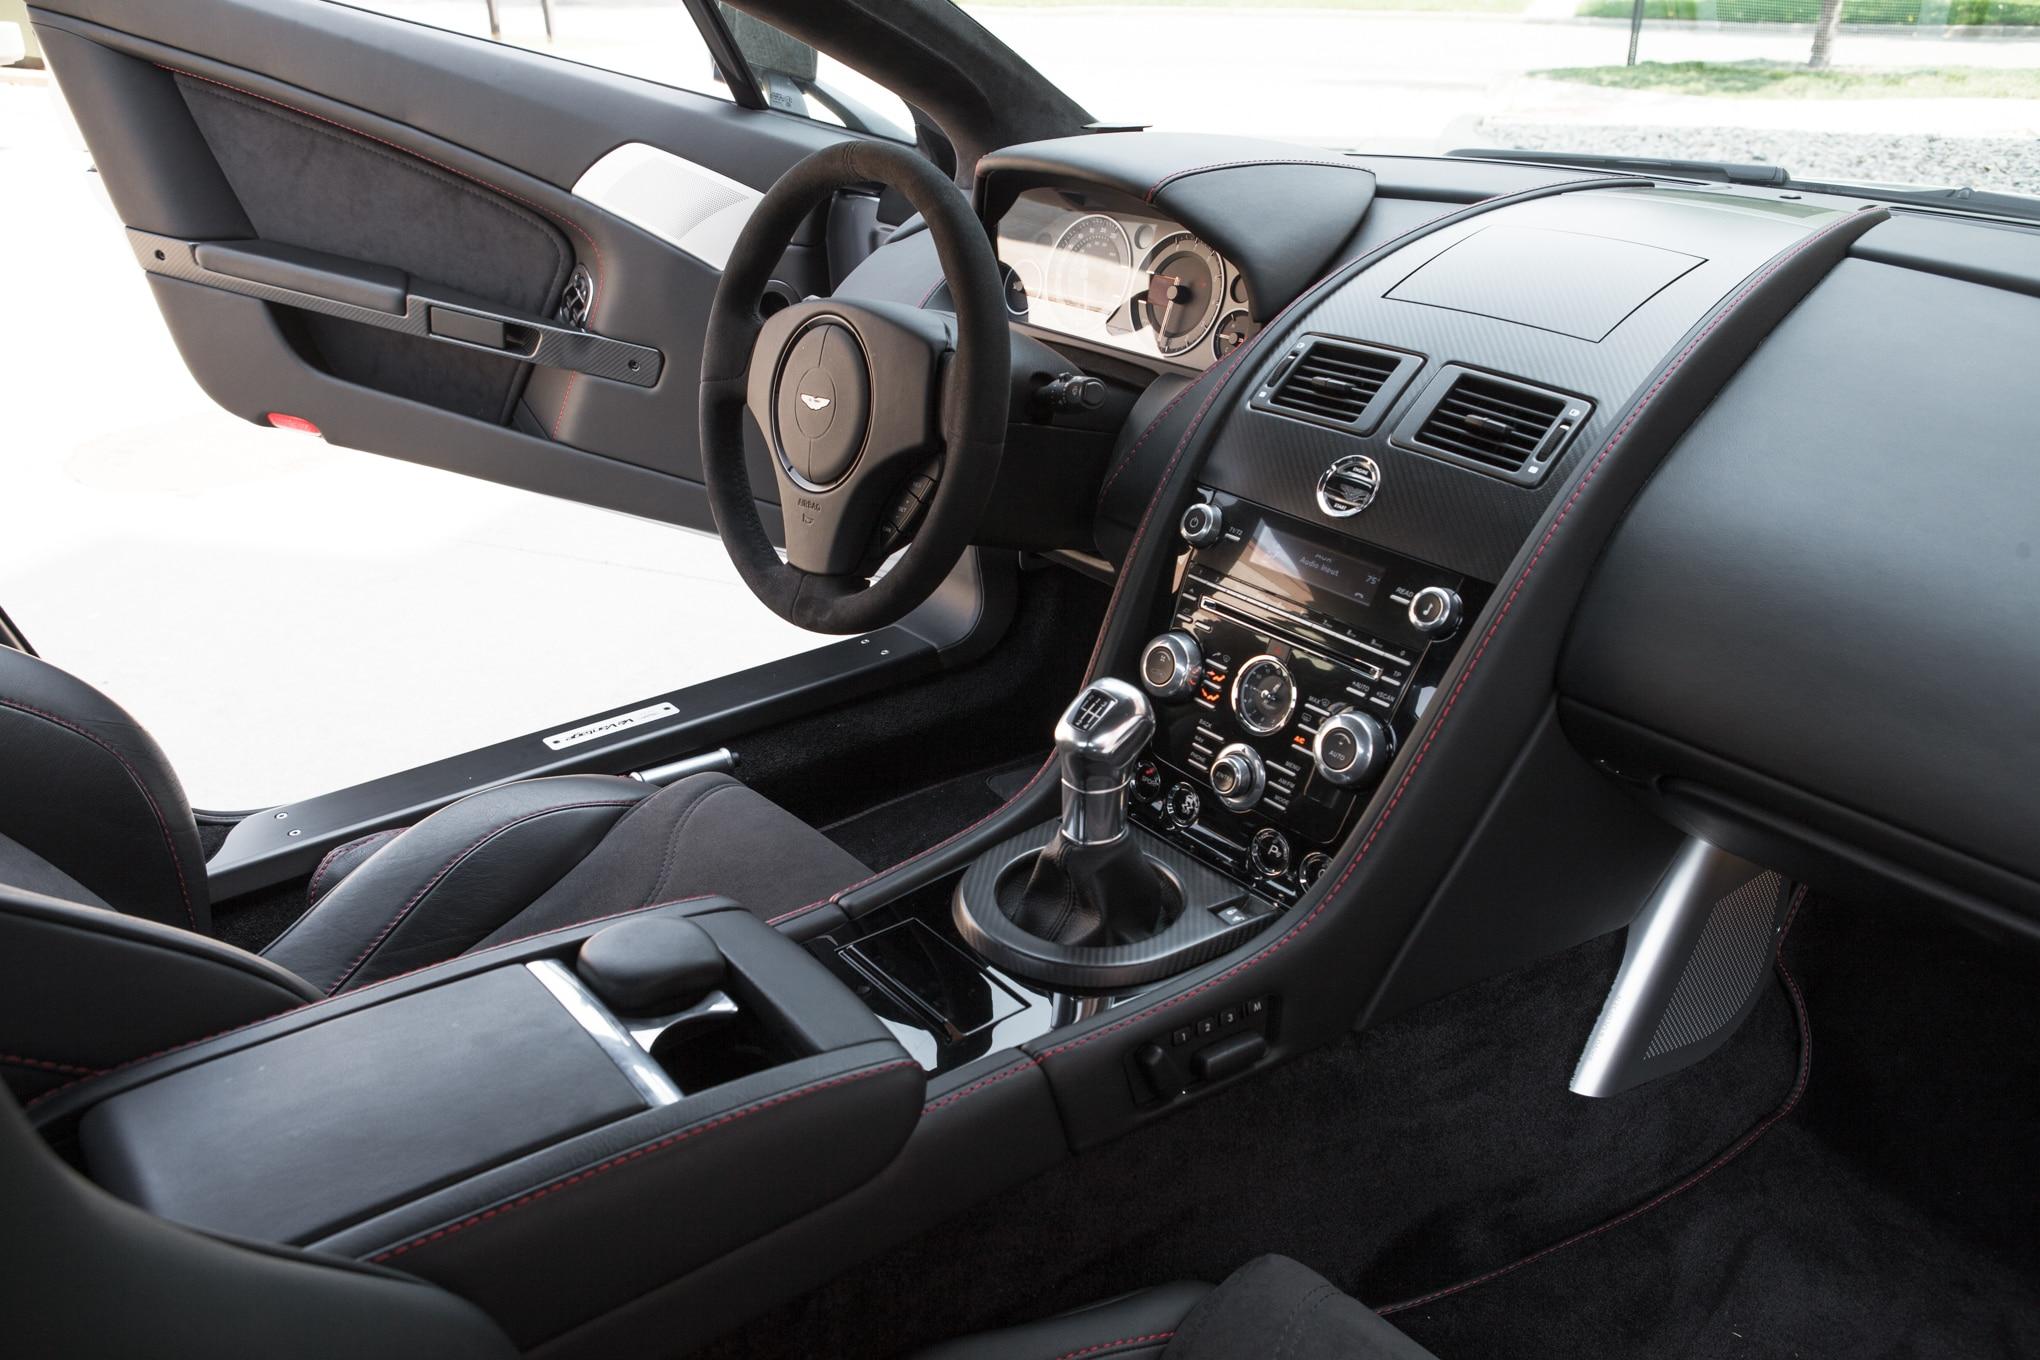 2012 aston martin v12 vantage - editors' notebook - automobile